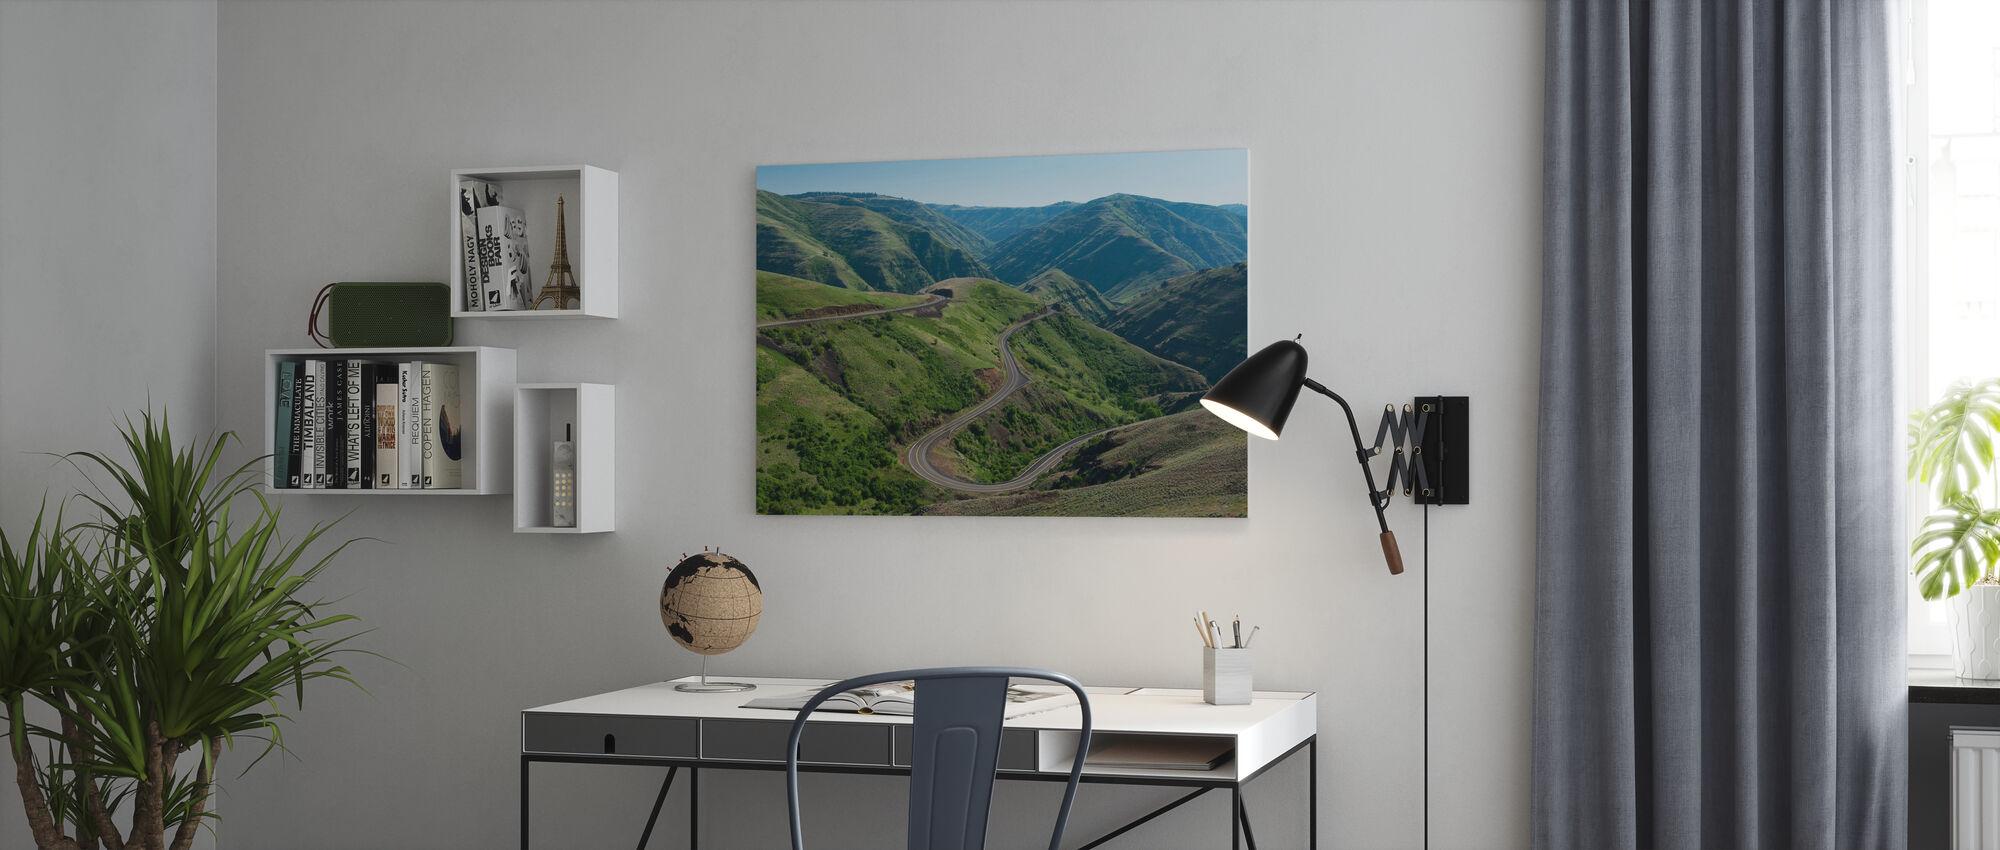 Asotin County - Canvas print - Office